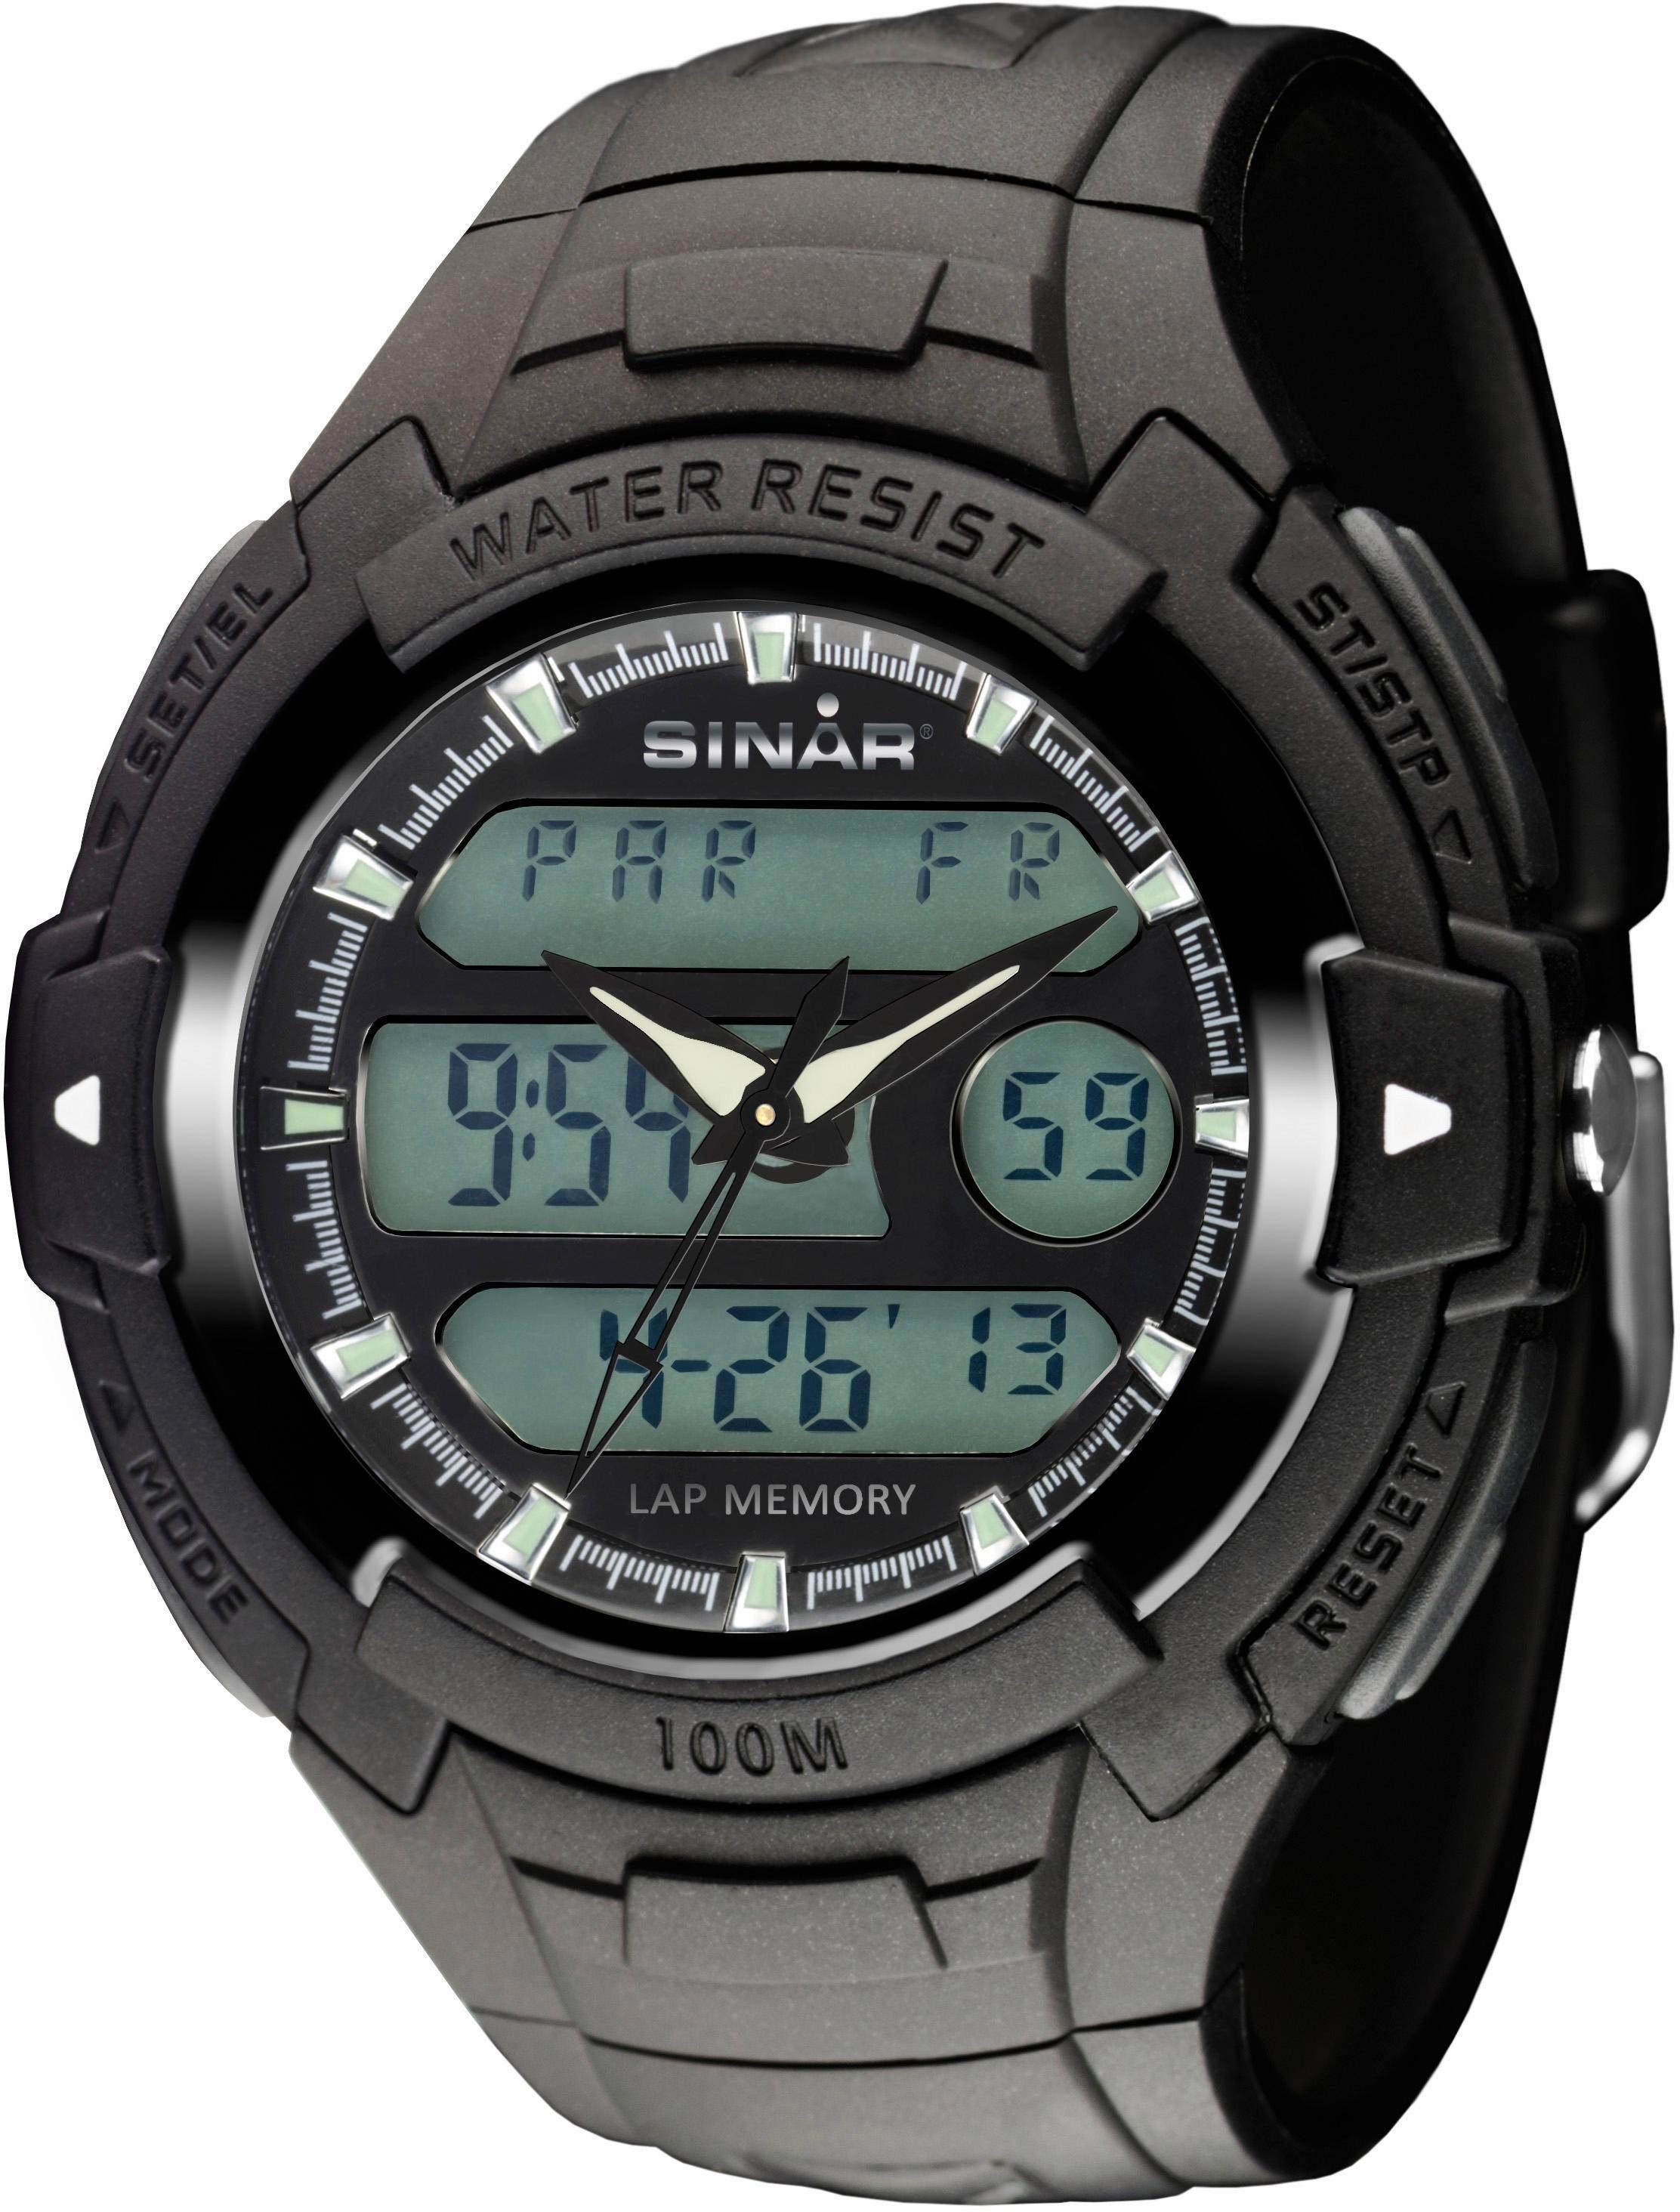 SINAR Chronograph »XAD-15-1«